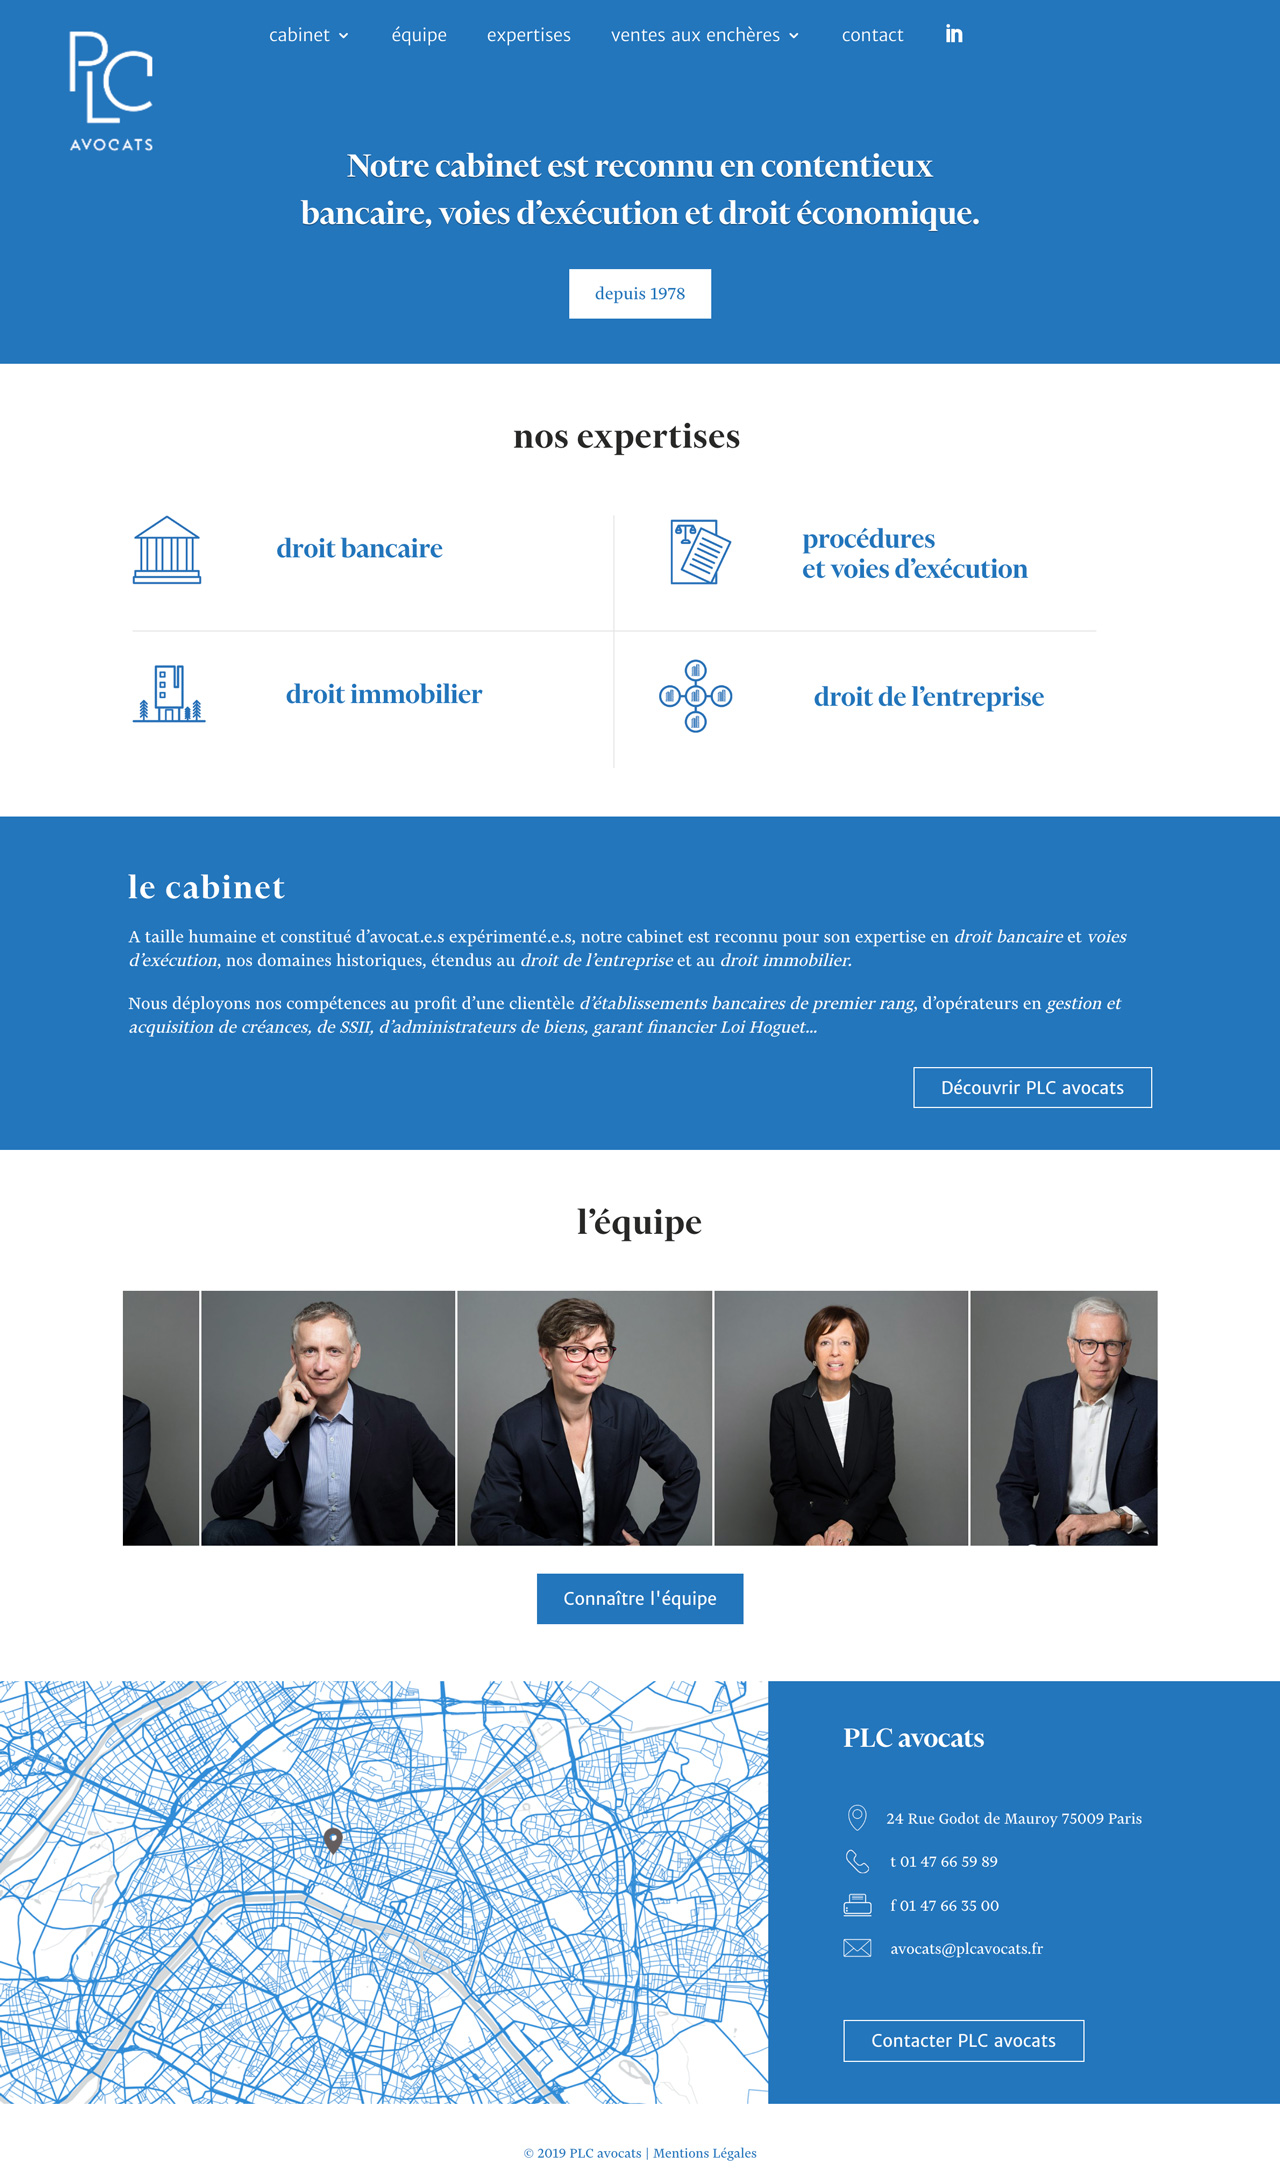 plcavocats.fr site internet